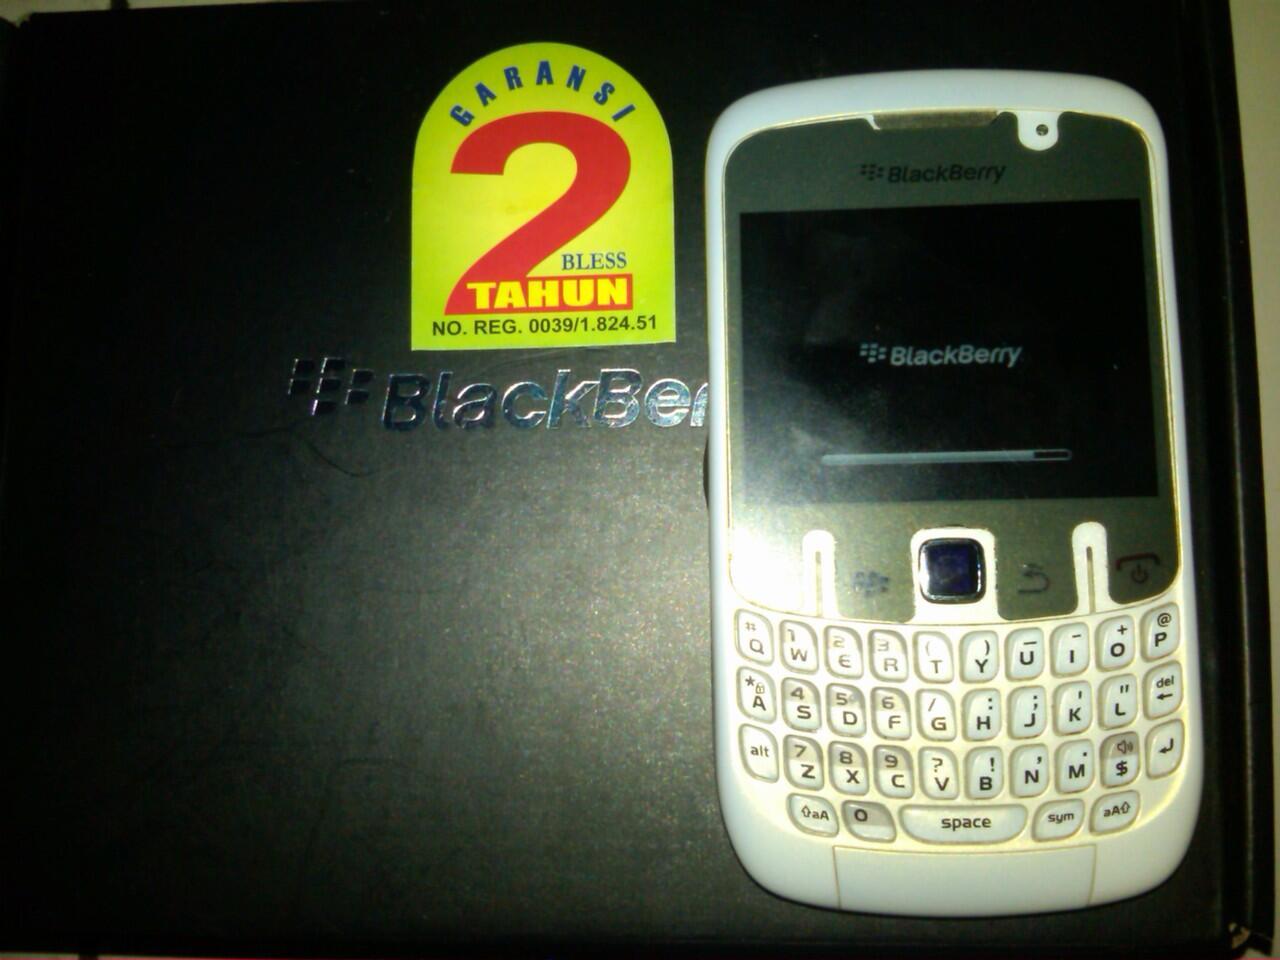 blackberry bb gemini 8520 white ,mulus dan maknyuss garansi masih panjang bangettt